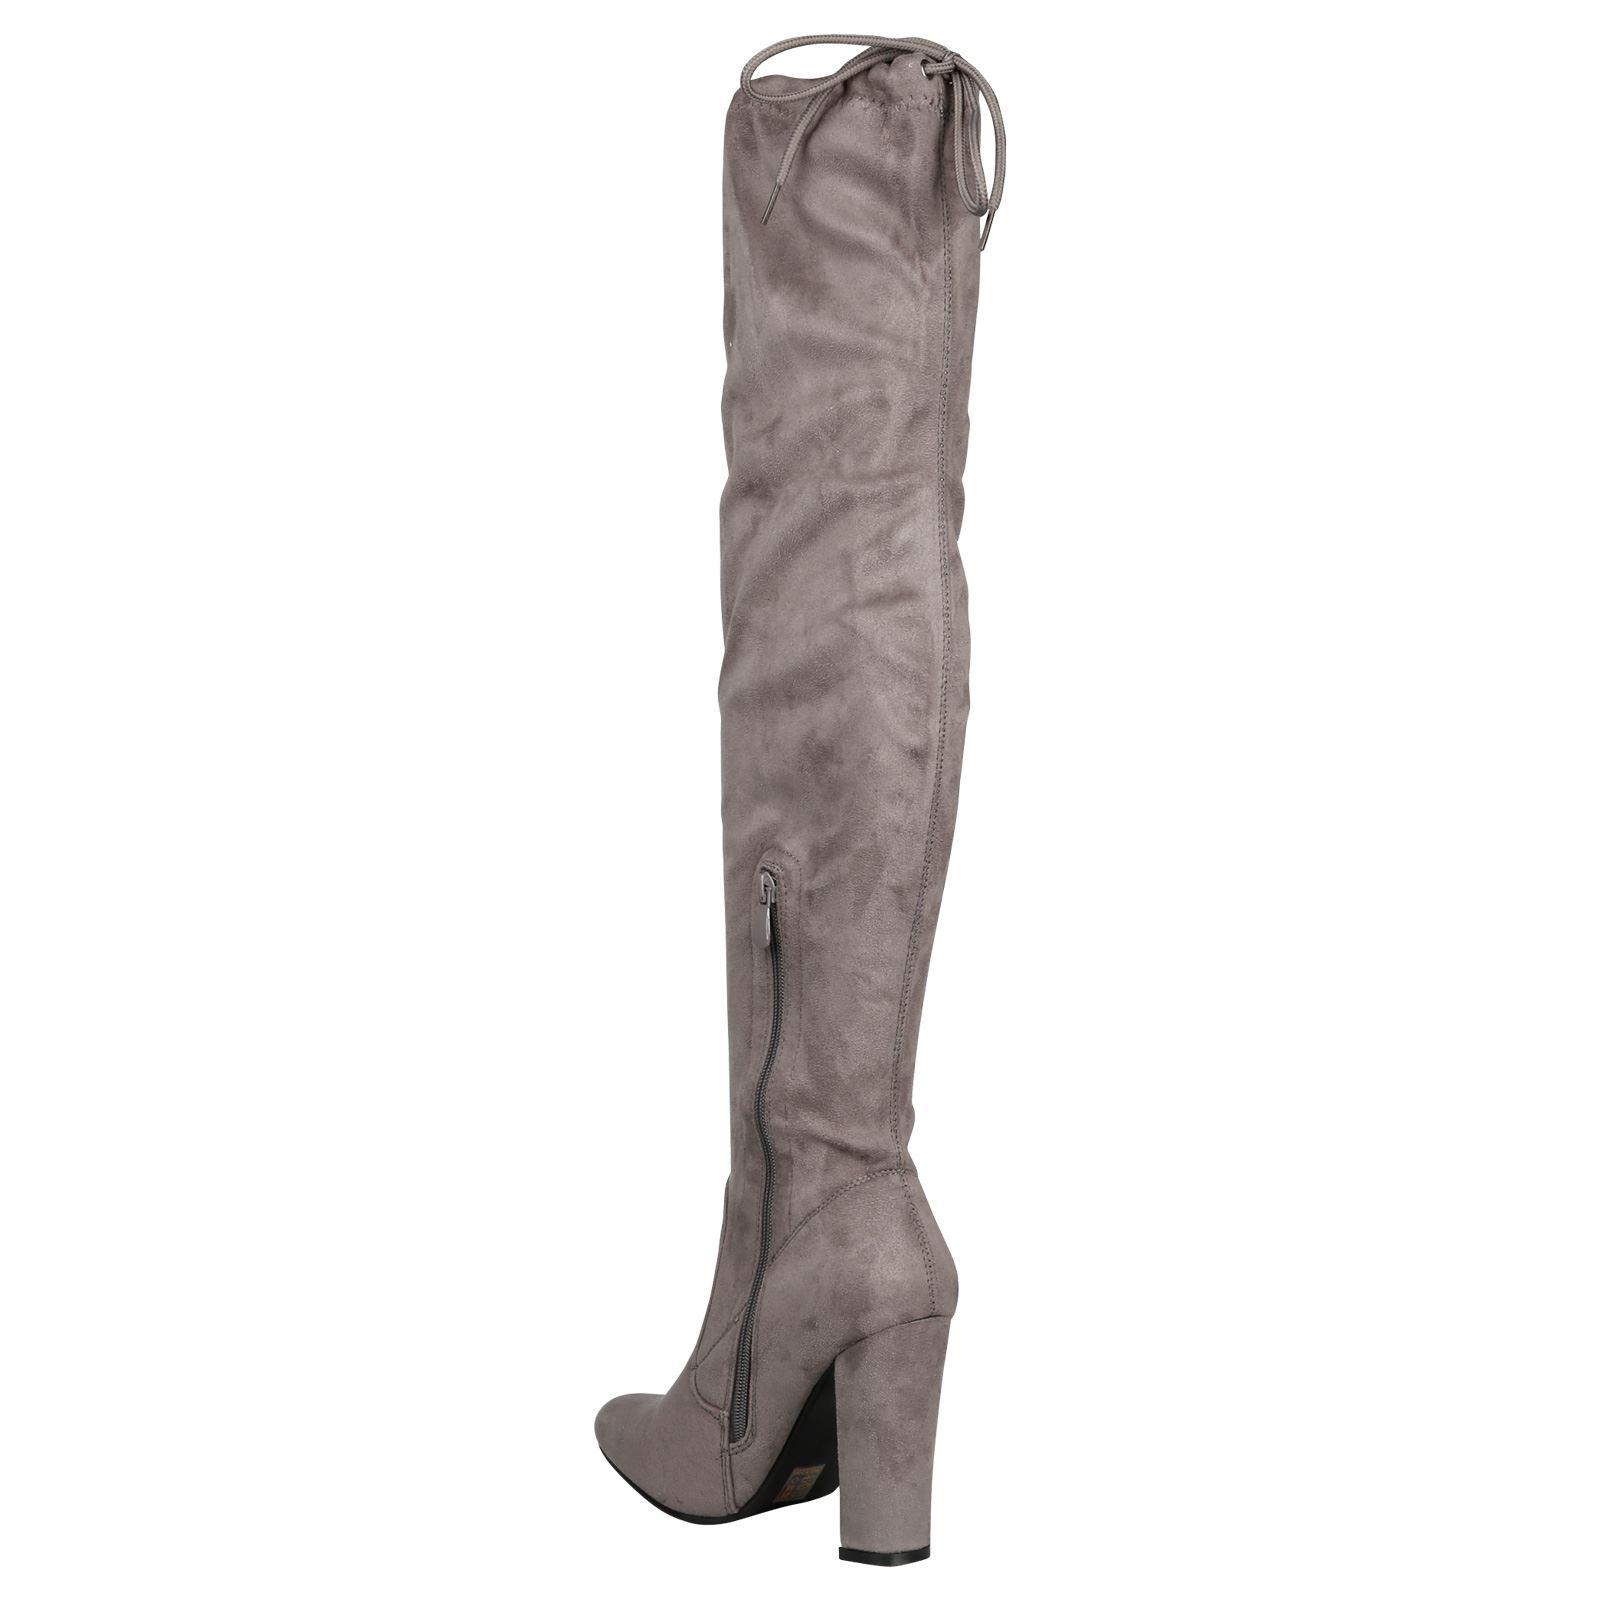 Iliana-Womens-Knee-High-Zip-Up-Adjustable-Pull-Strings-Mid-High-Block-Heel-Boots thumbnail 13